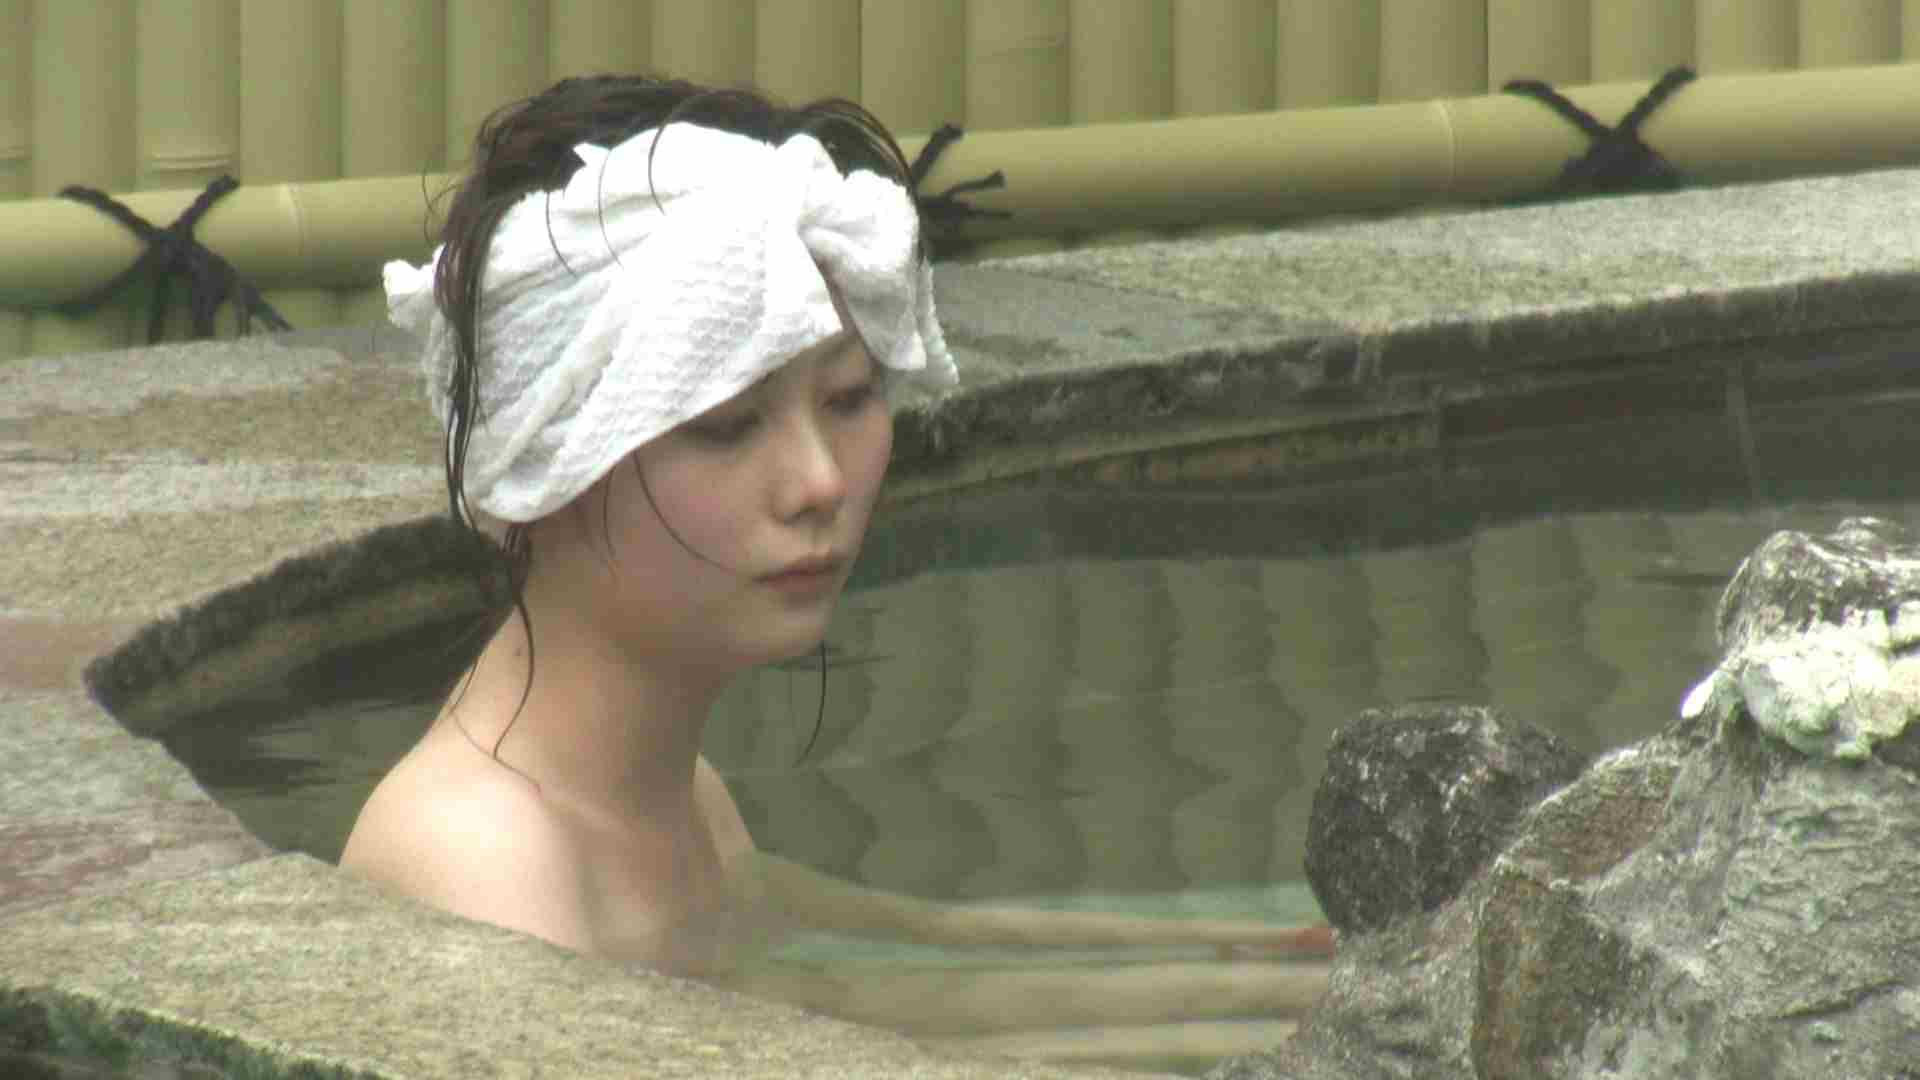 Aquaな露天風呂Vol.147 盗撮 | OLセックス  85画像 49